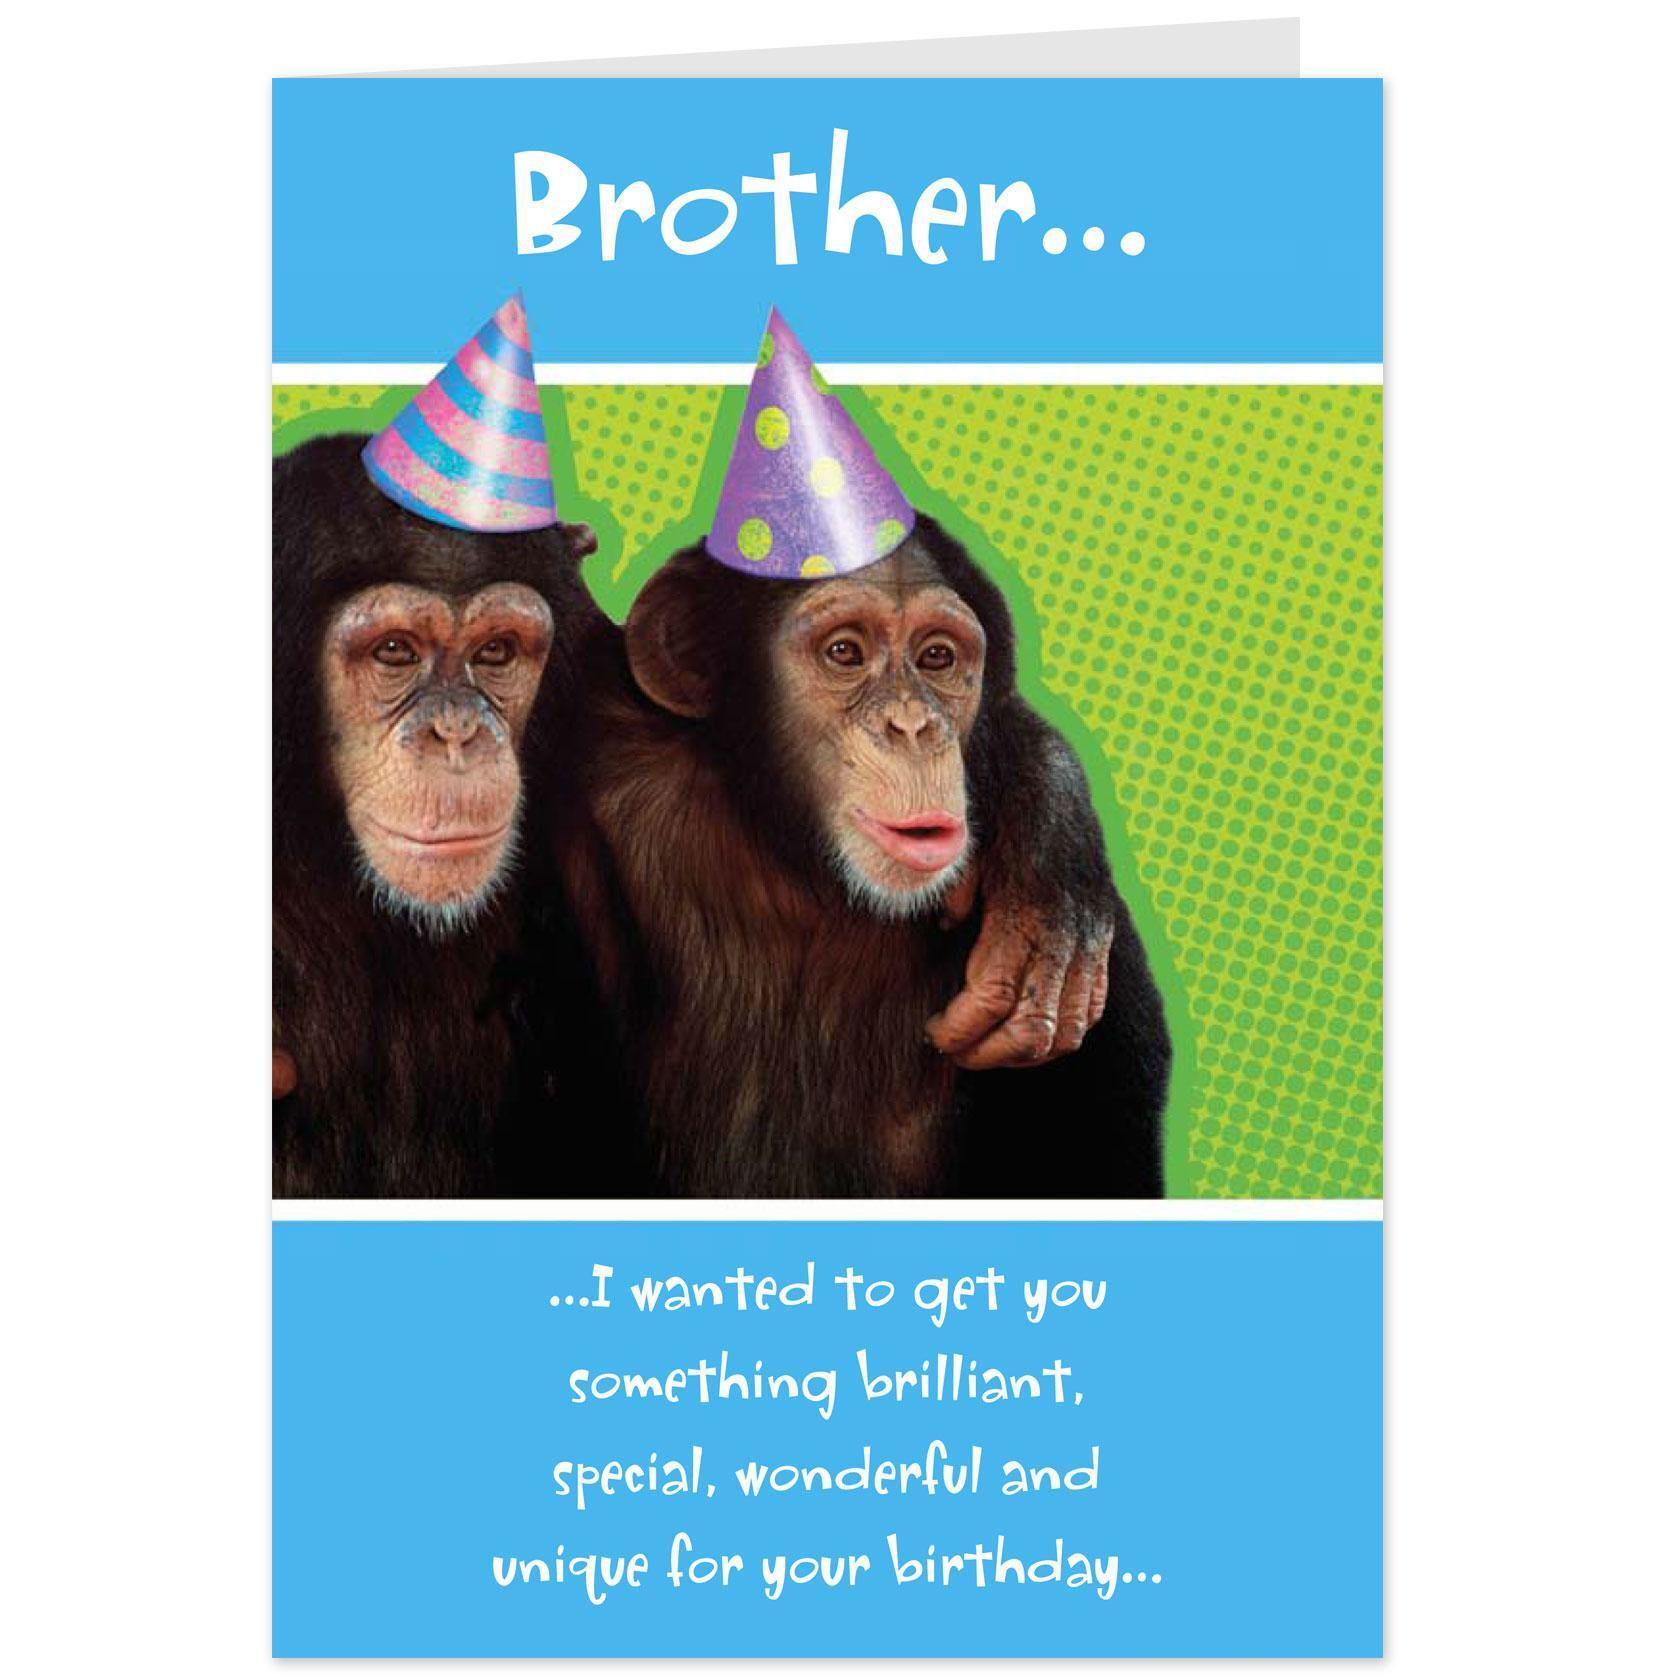 Chimp Doctor Monkey Cards – Funny Monkey Birthday Cards